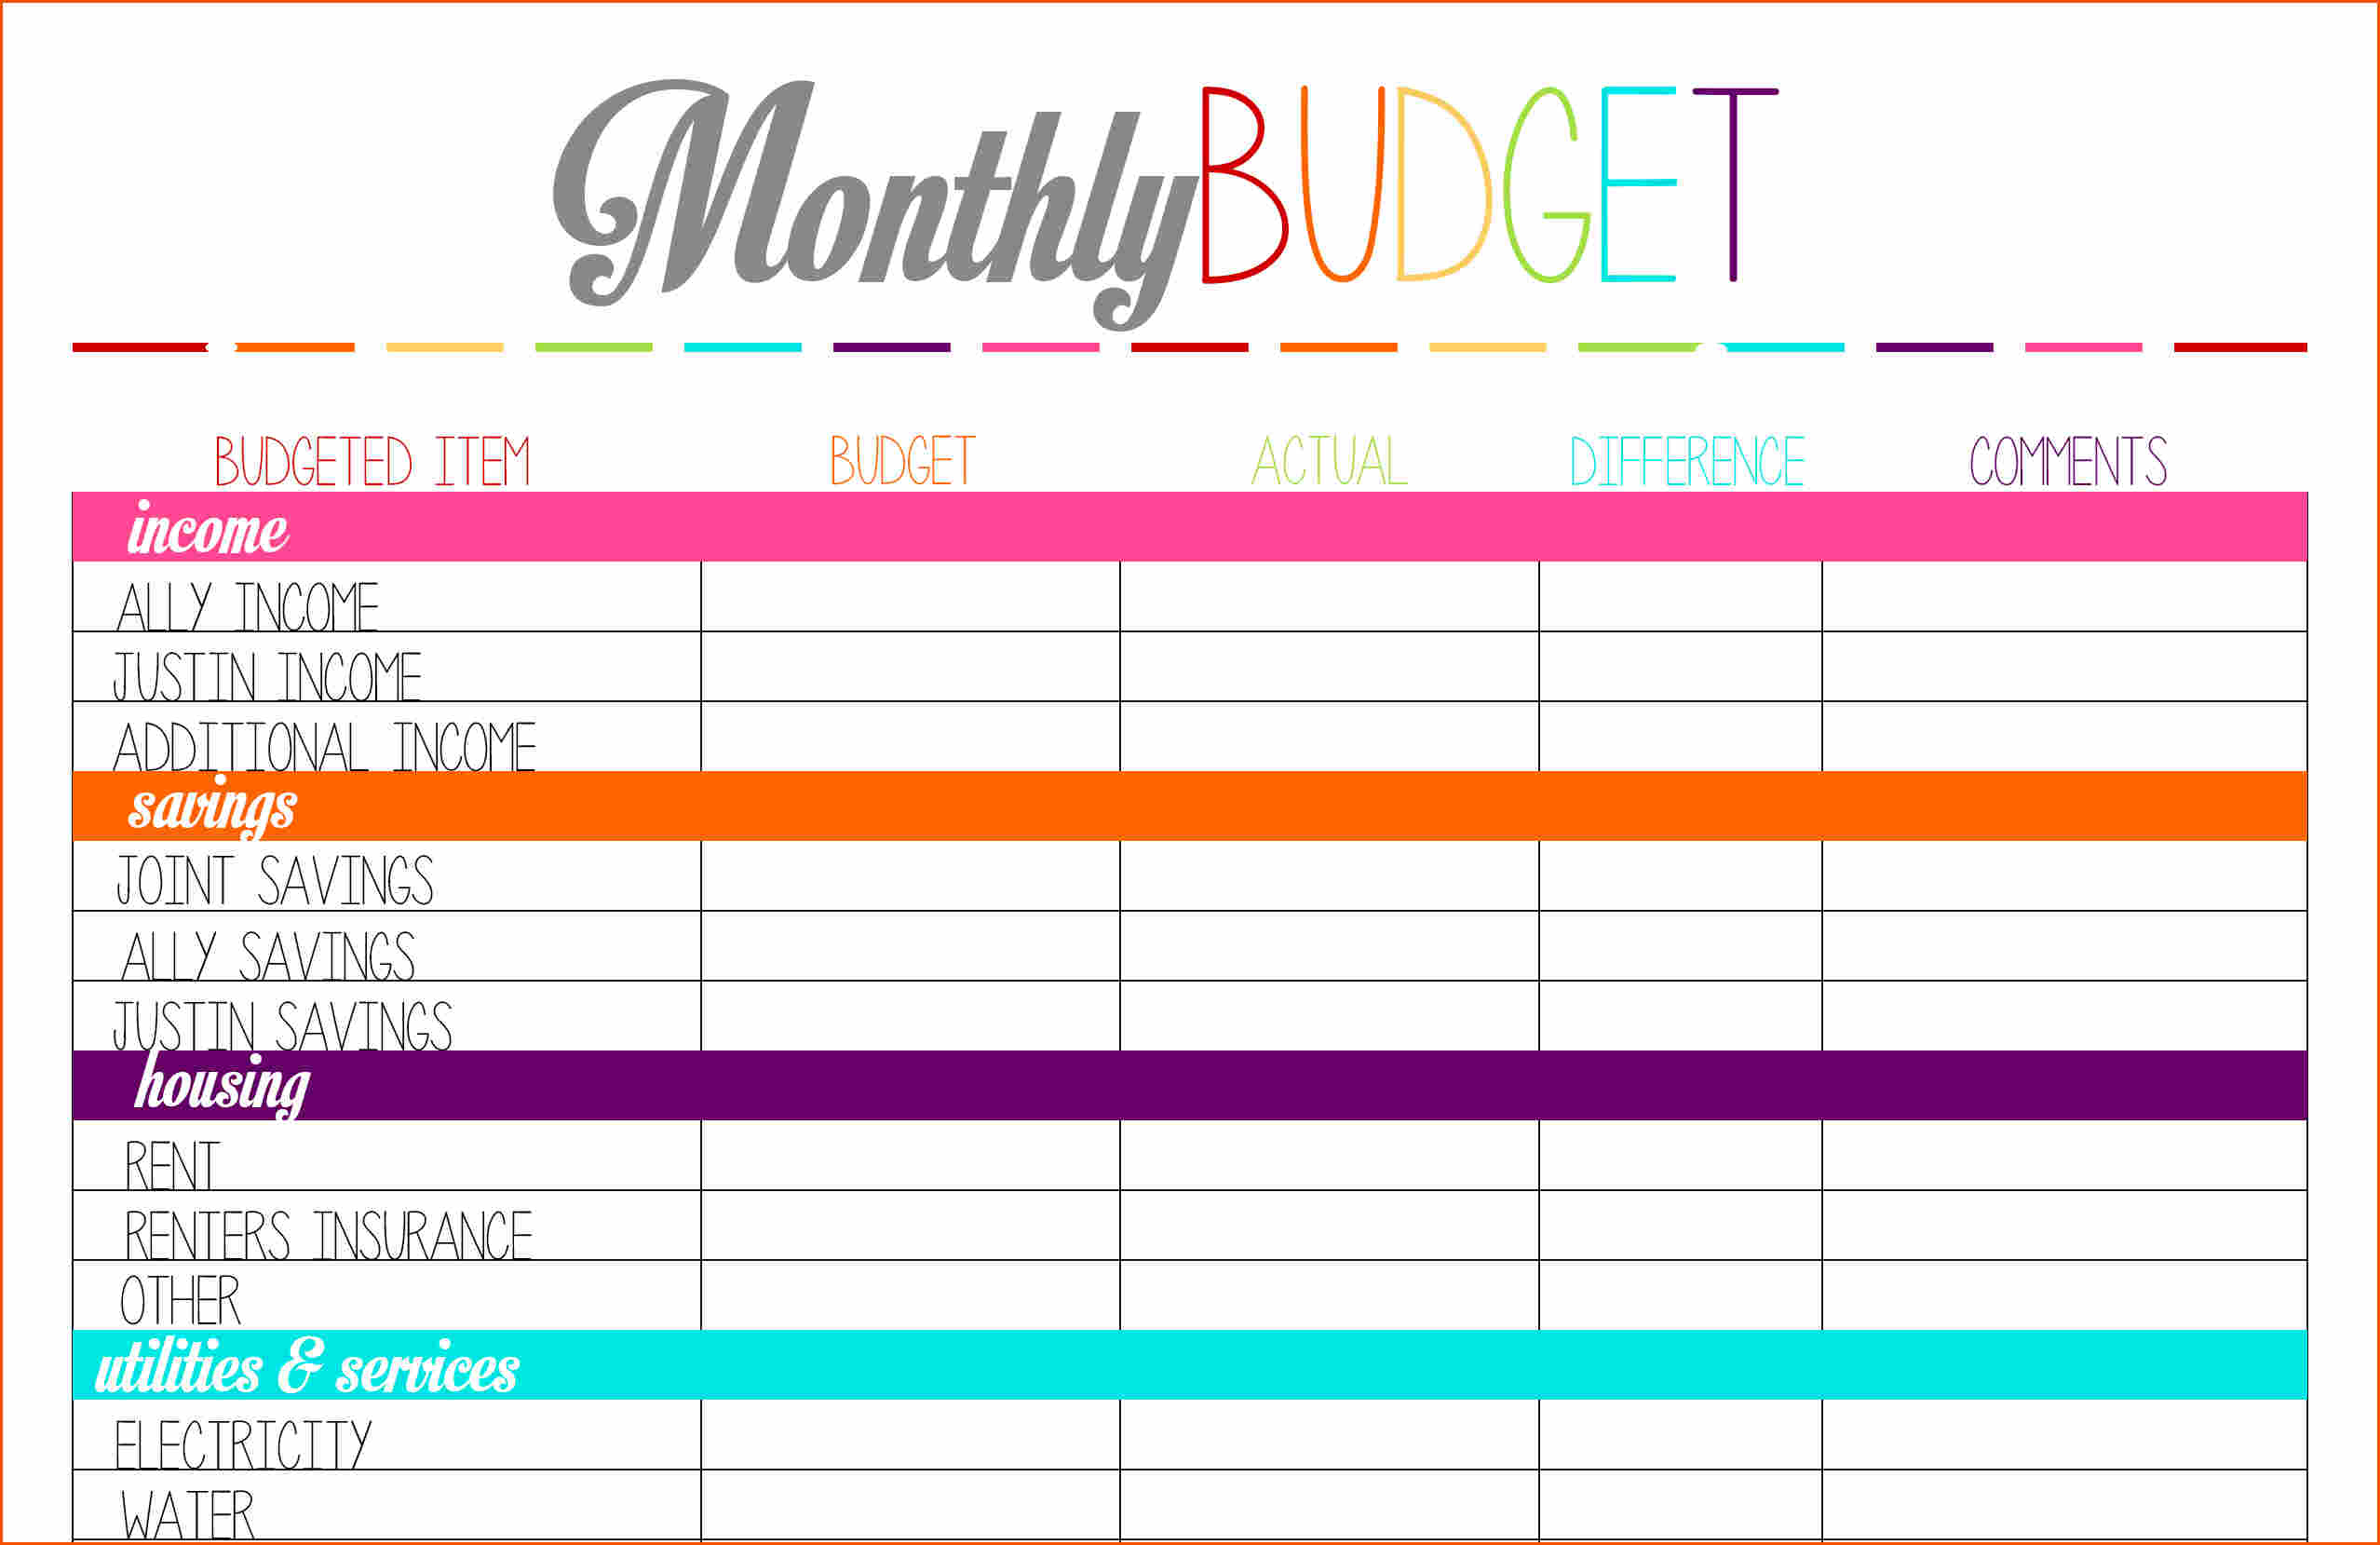 Budget Helper Worksheet - Koran.sticken.co | Budget Helper Worksheet Printable